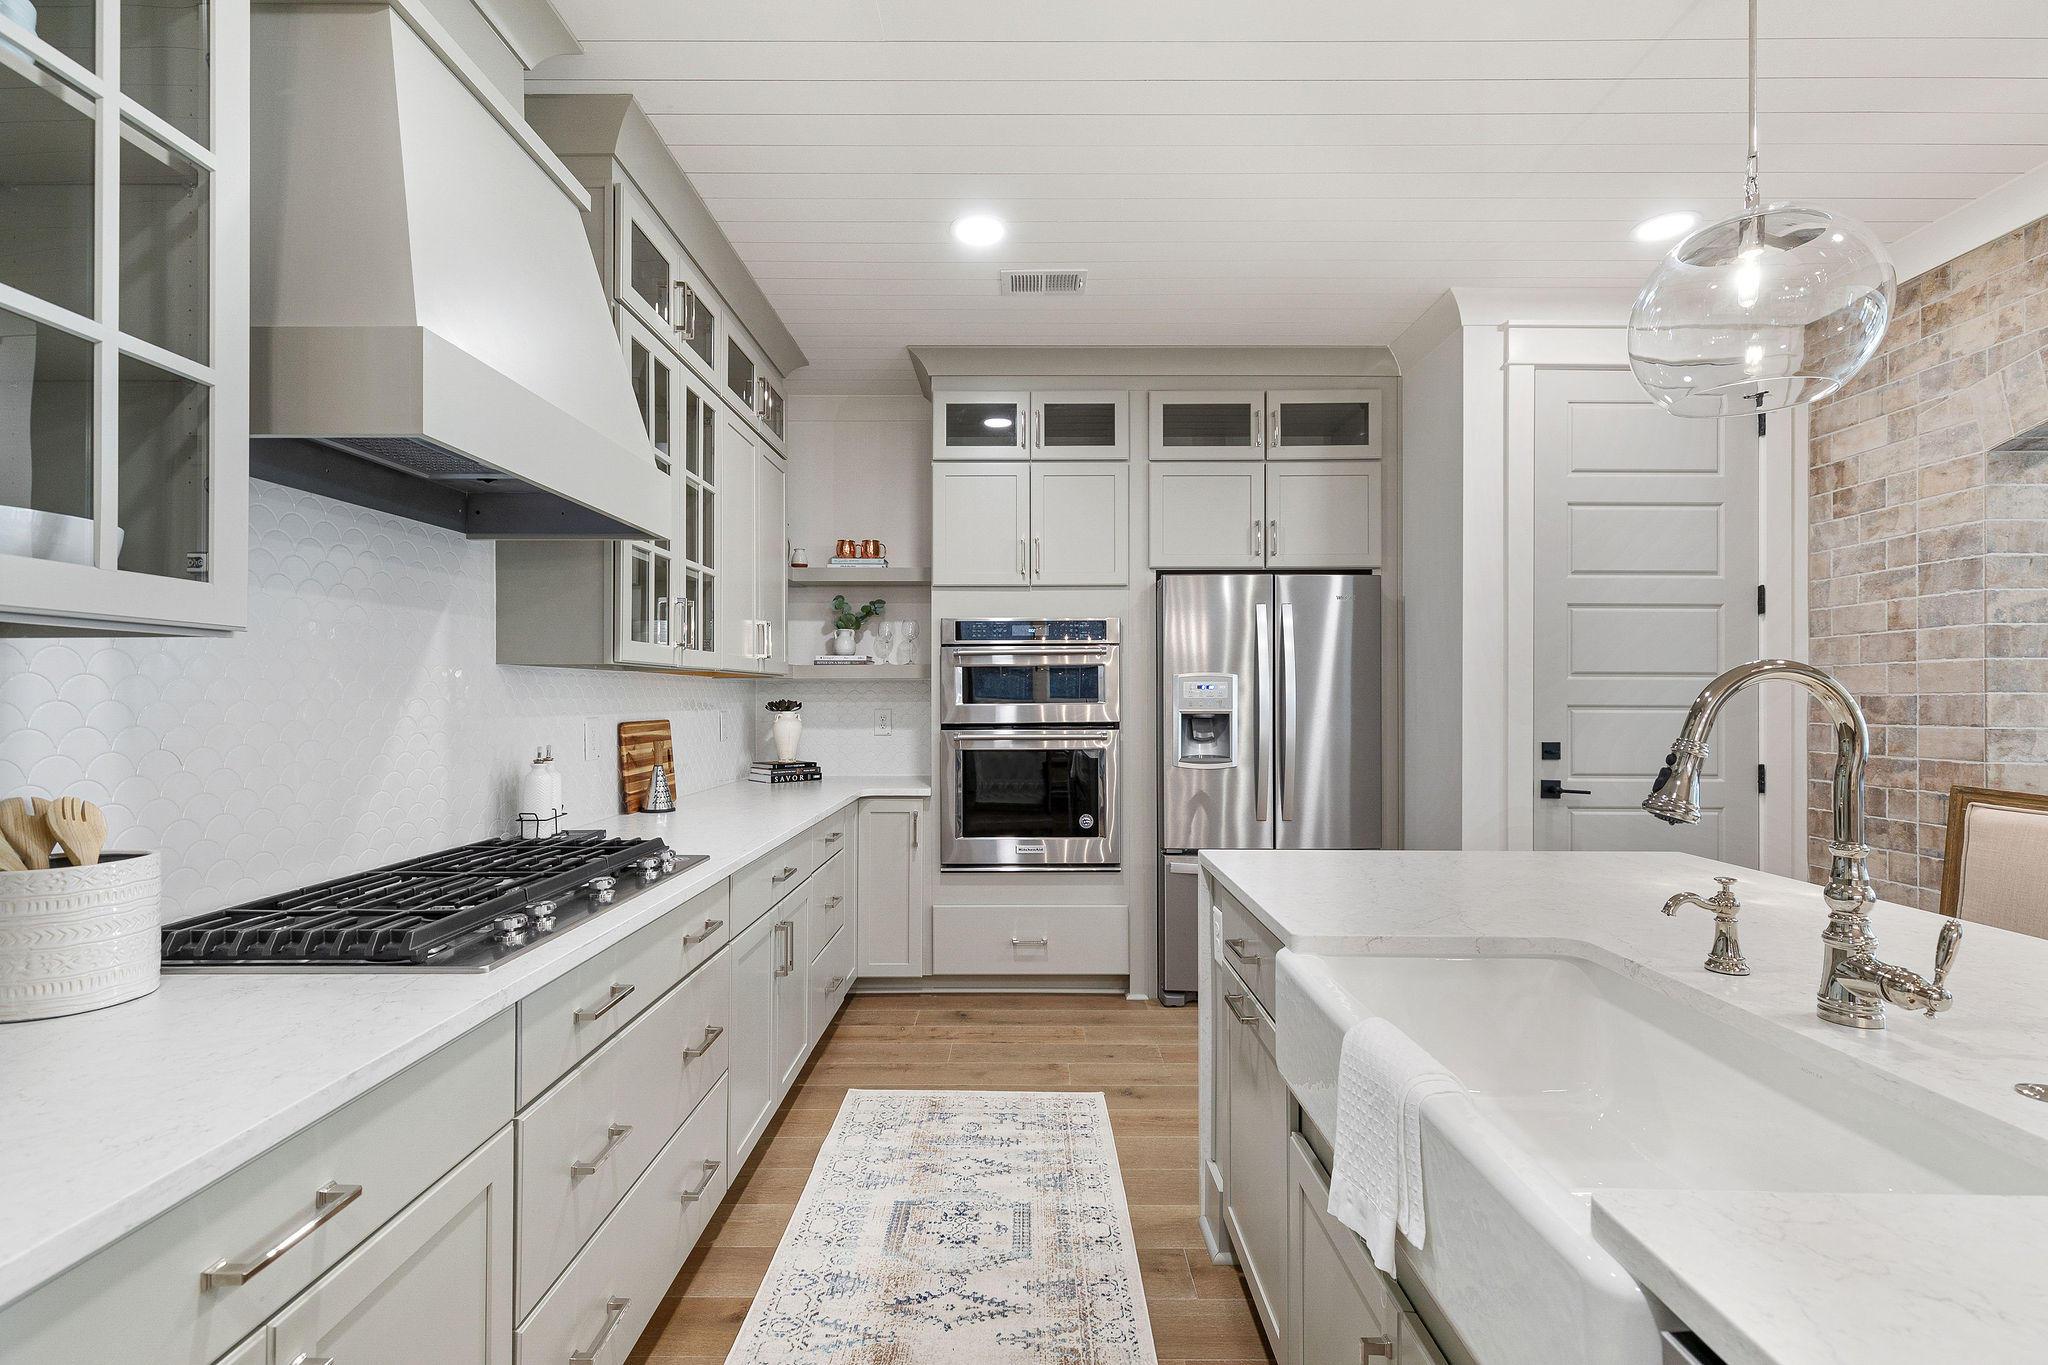 Avenue of Oaks Homes For Sale - 1027 Avenue Of Oaks, Charleston, SC - 33